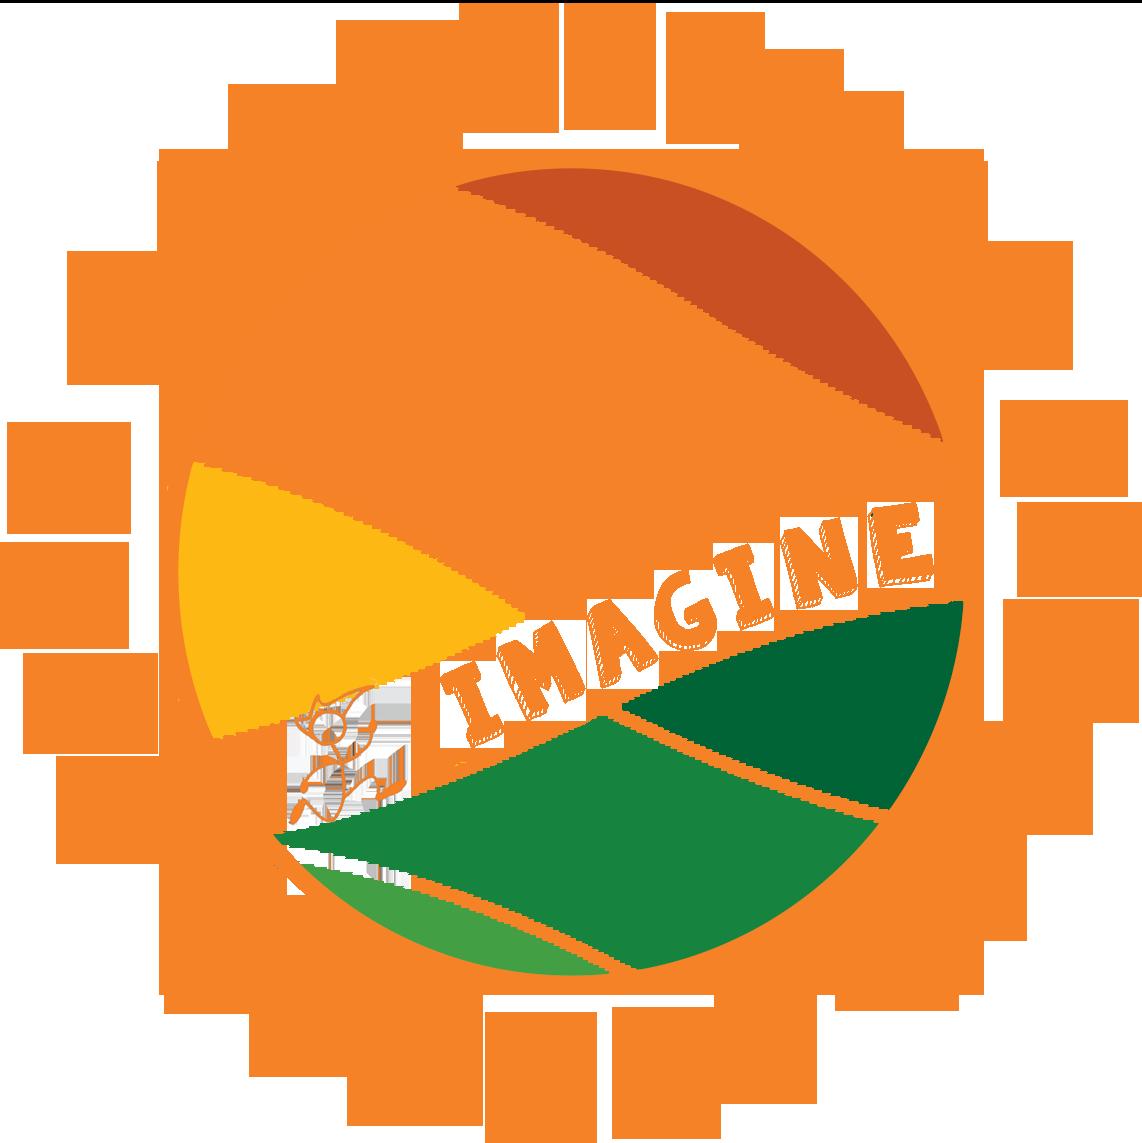 Barnesville school camp . Movement clipart vigorous